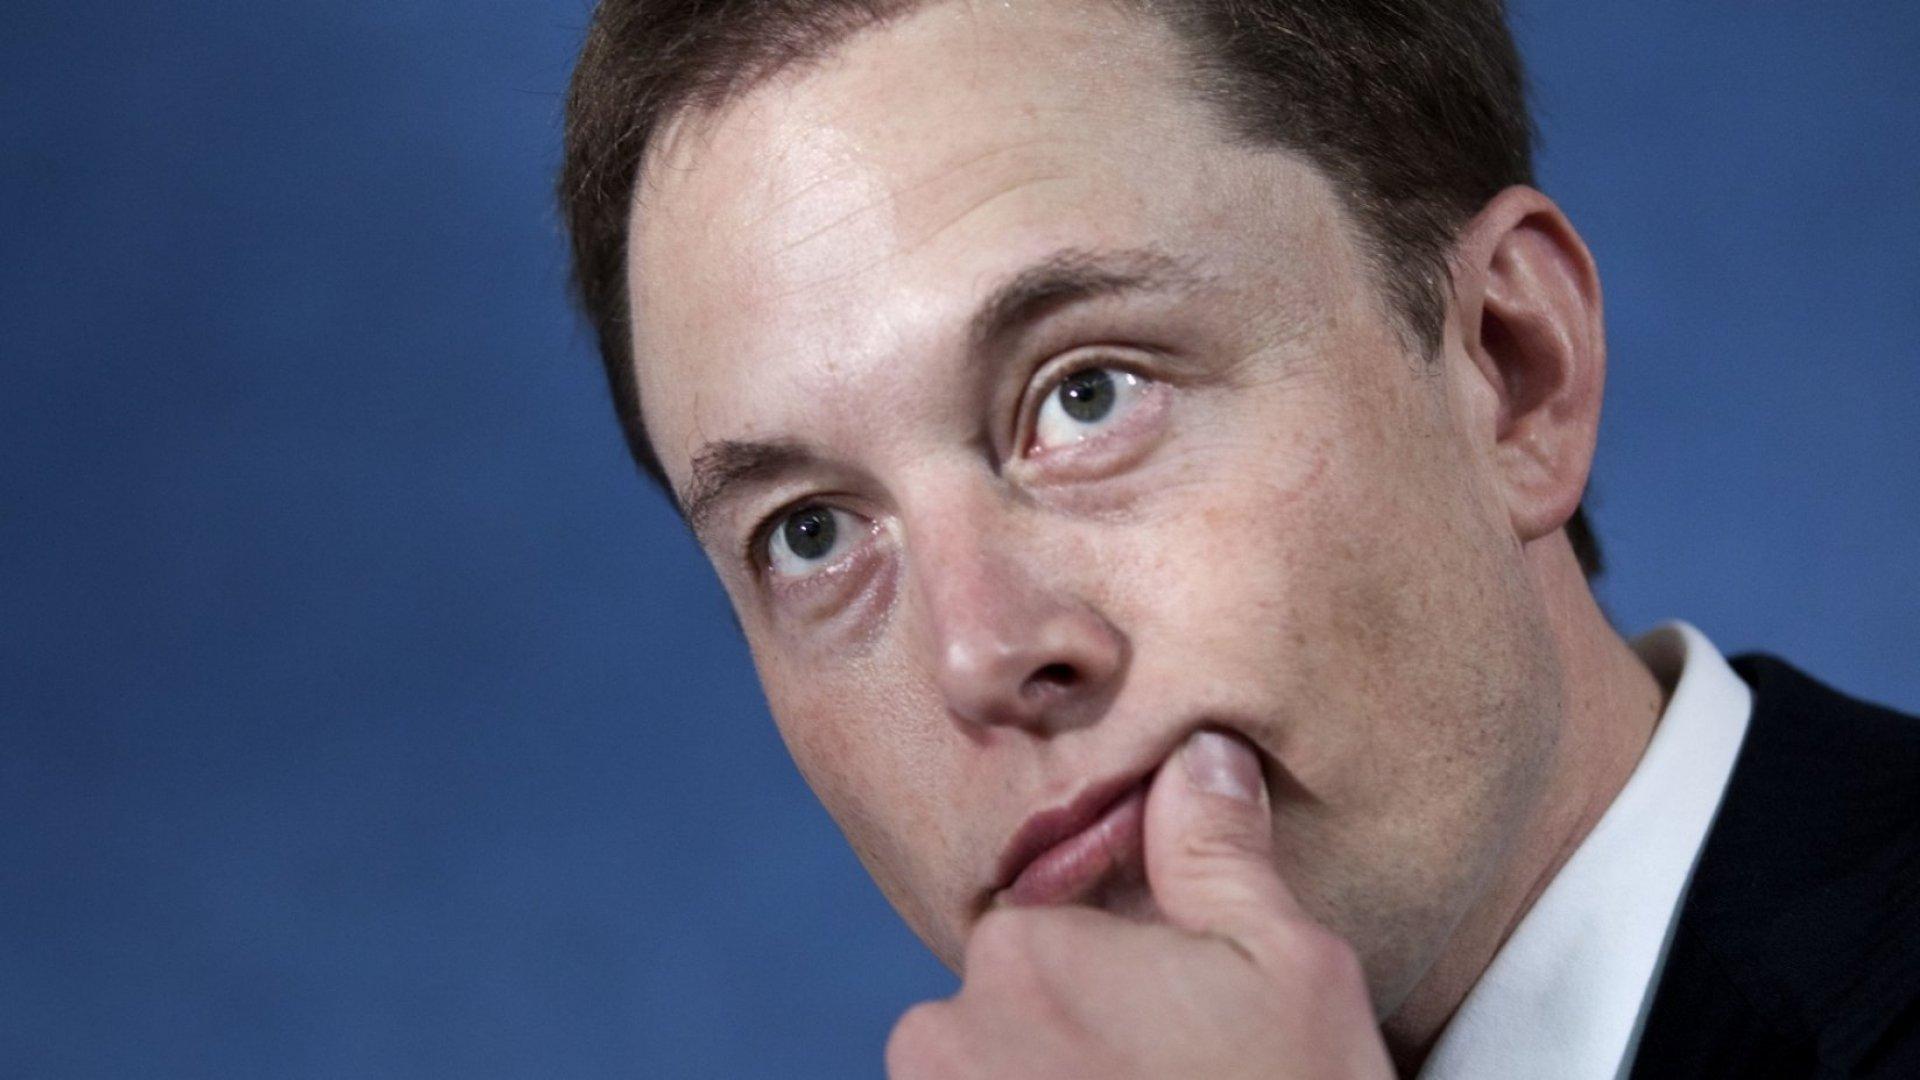 17 Reasons Elon Musk Fears Killer Robots